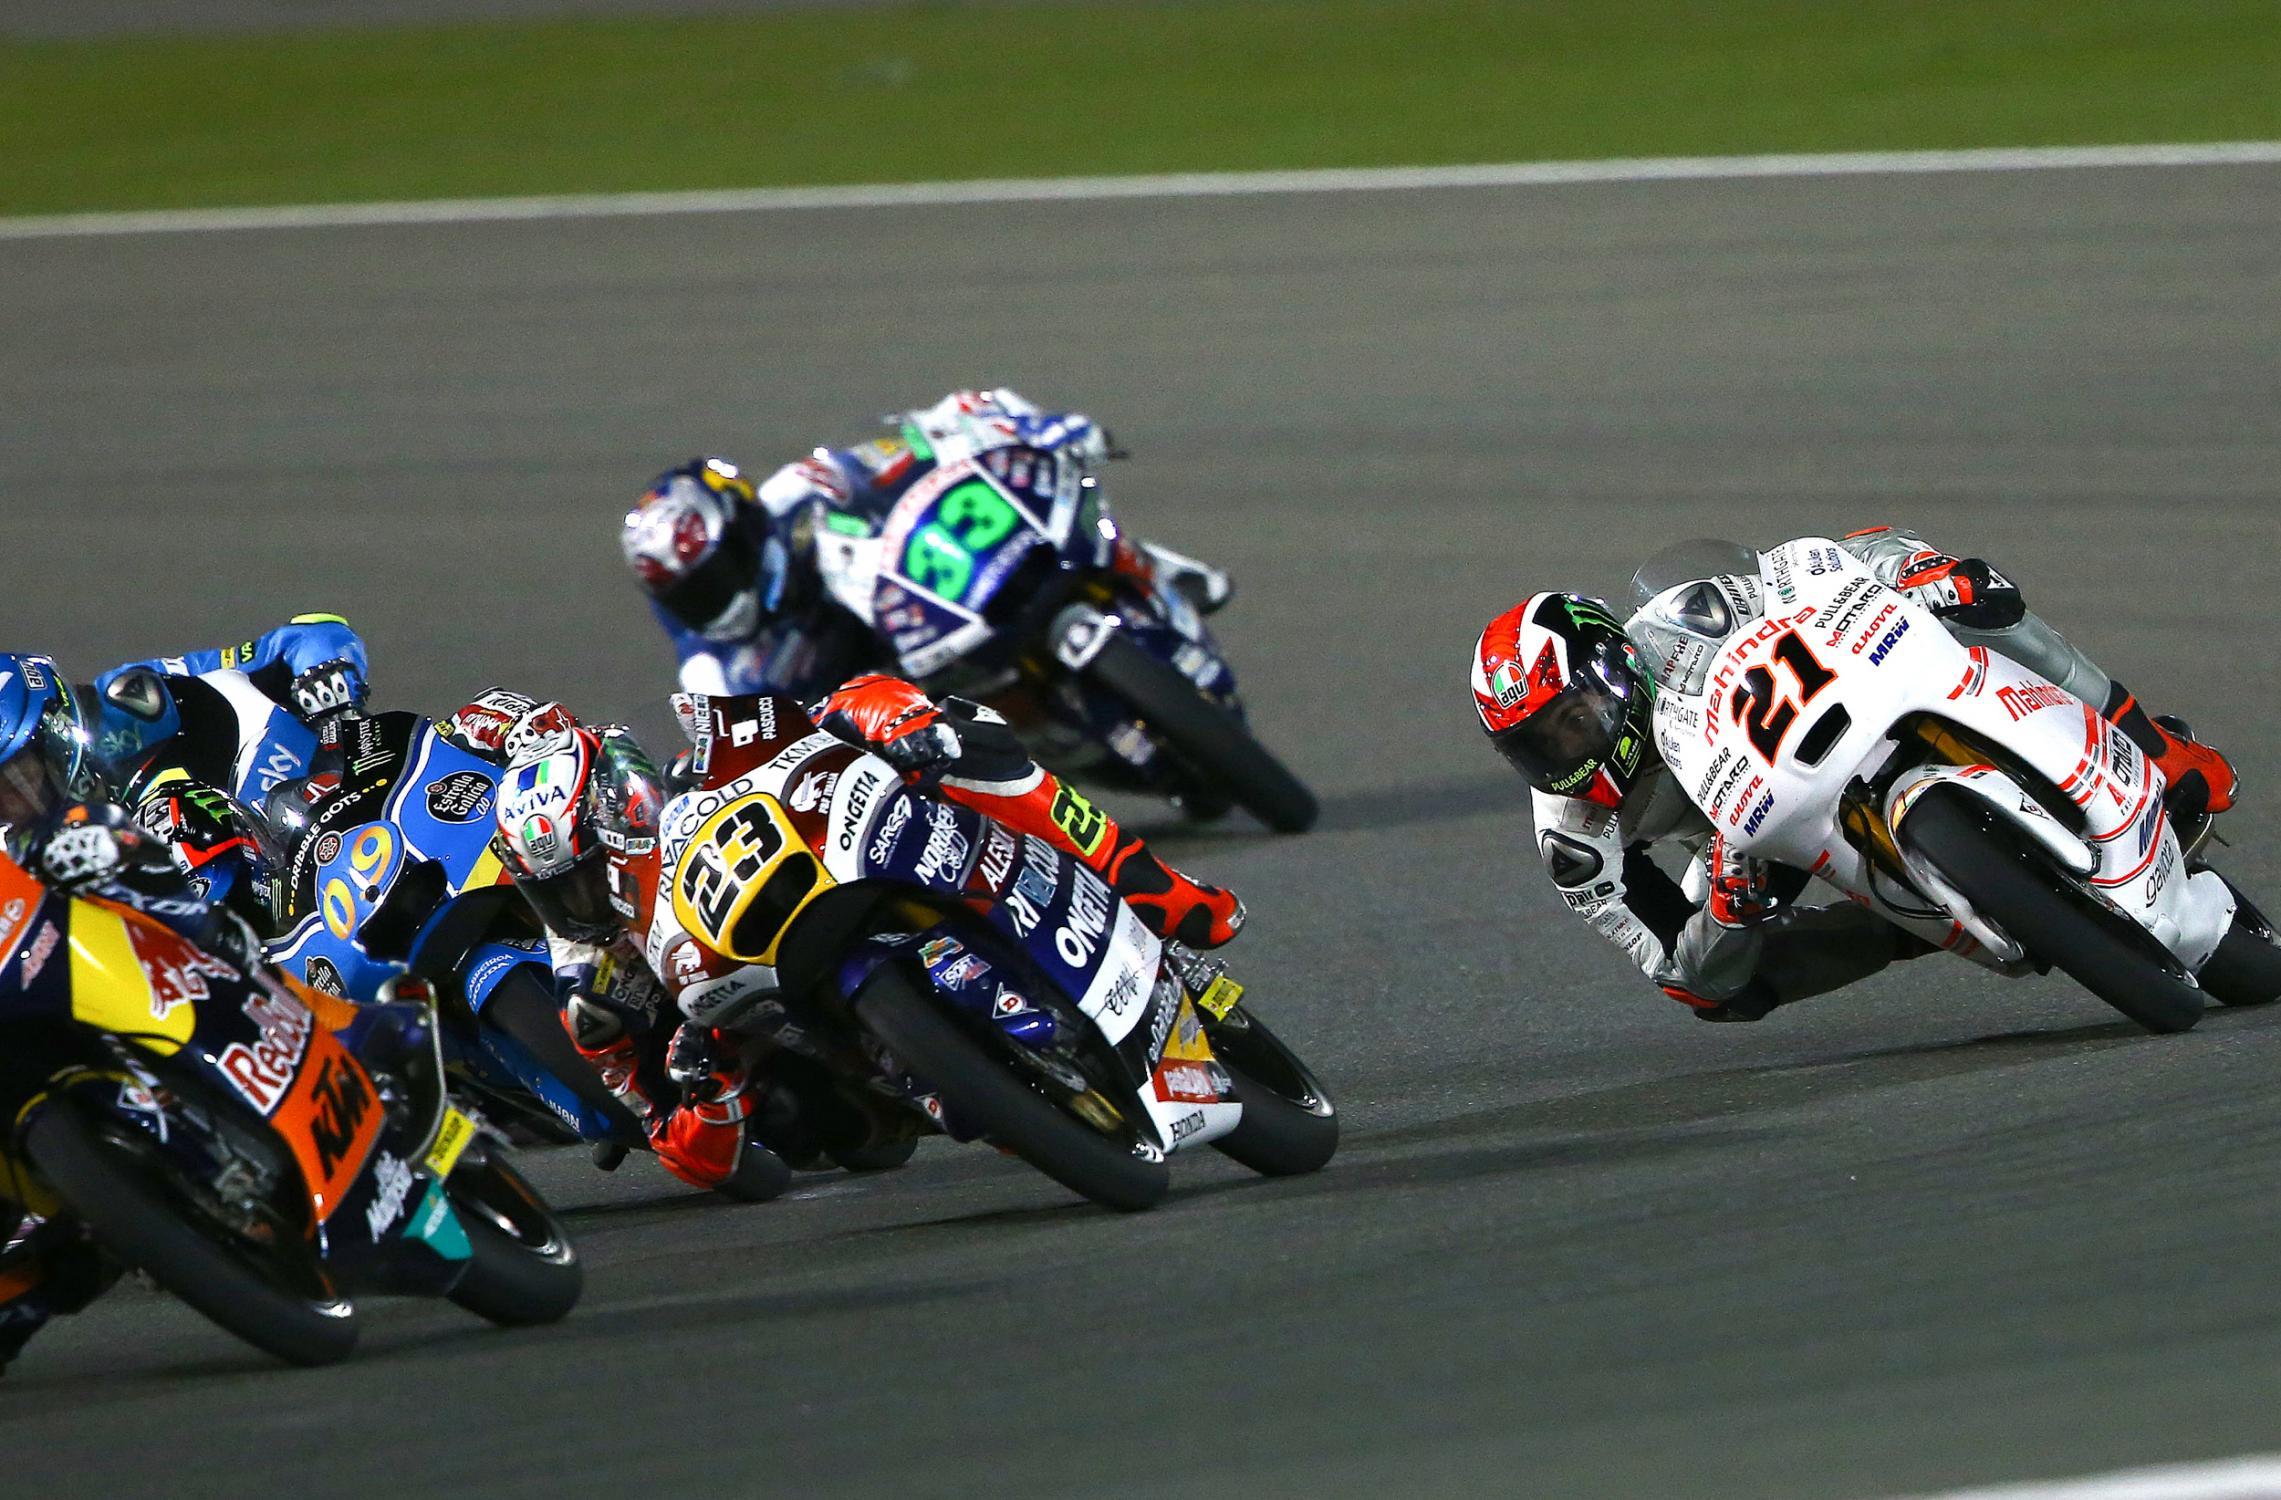 [GP] Qatar - Page 2 Action_dg1_5495.gallery_full_top_fullscreen